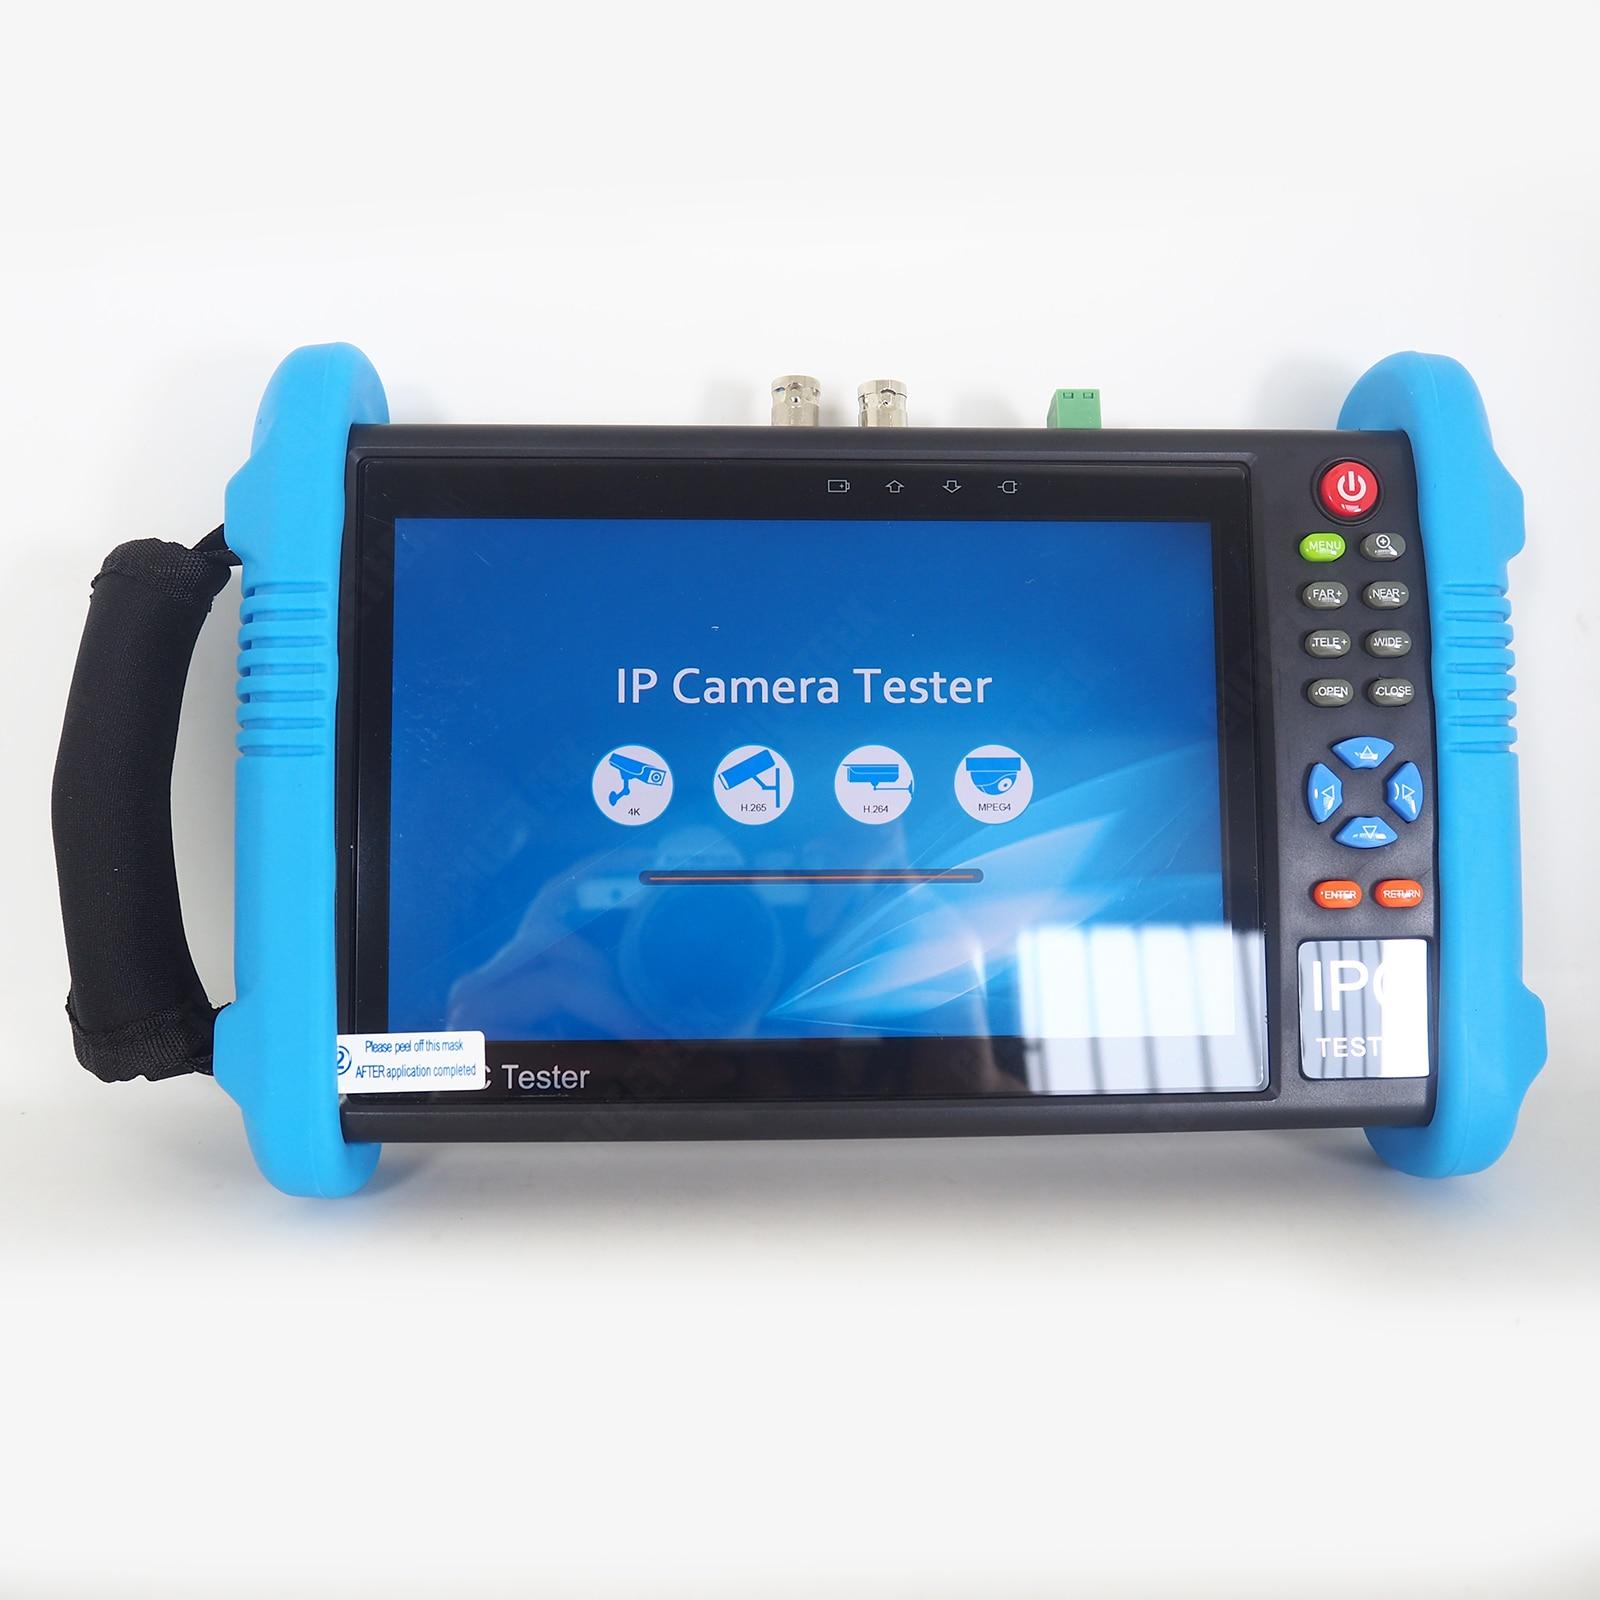 9800PLUS 7 zoll 1920*1200 IP Kamera Tester 4K 1080P IPC CCTV Monitor Video POE Test touchscreen HDMl Entdeckung